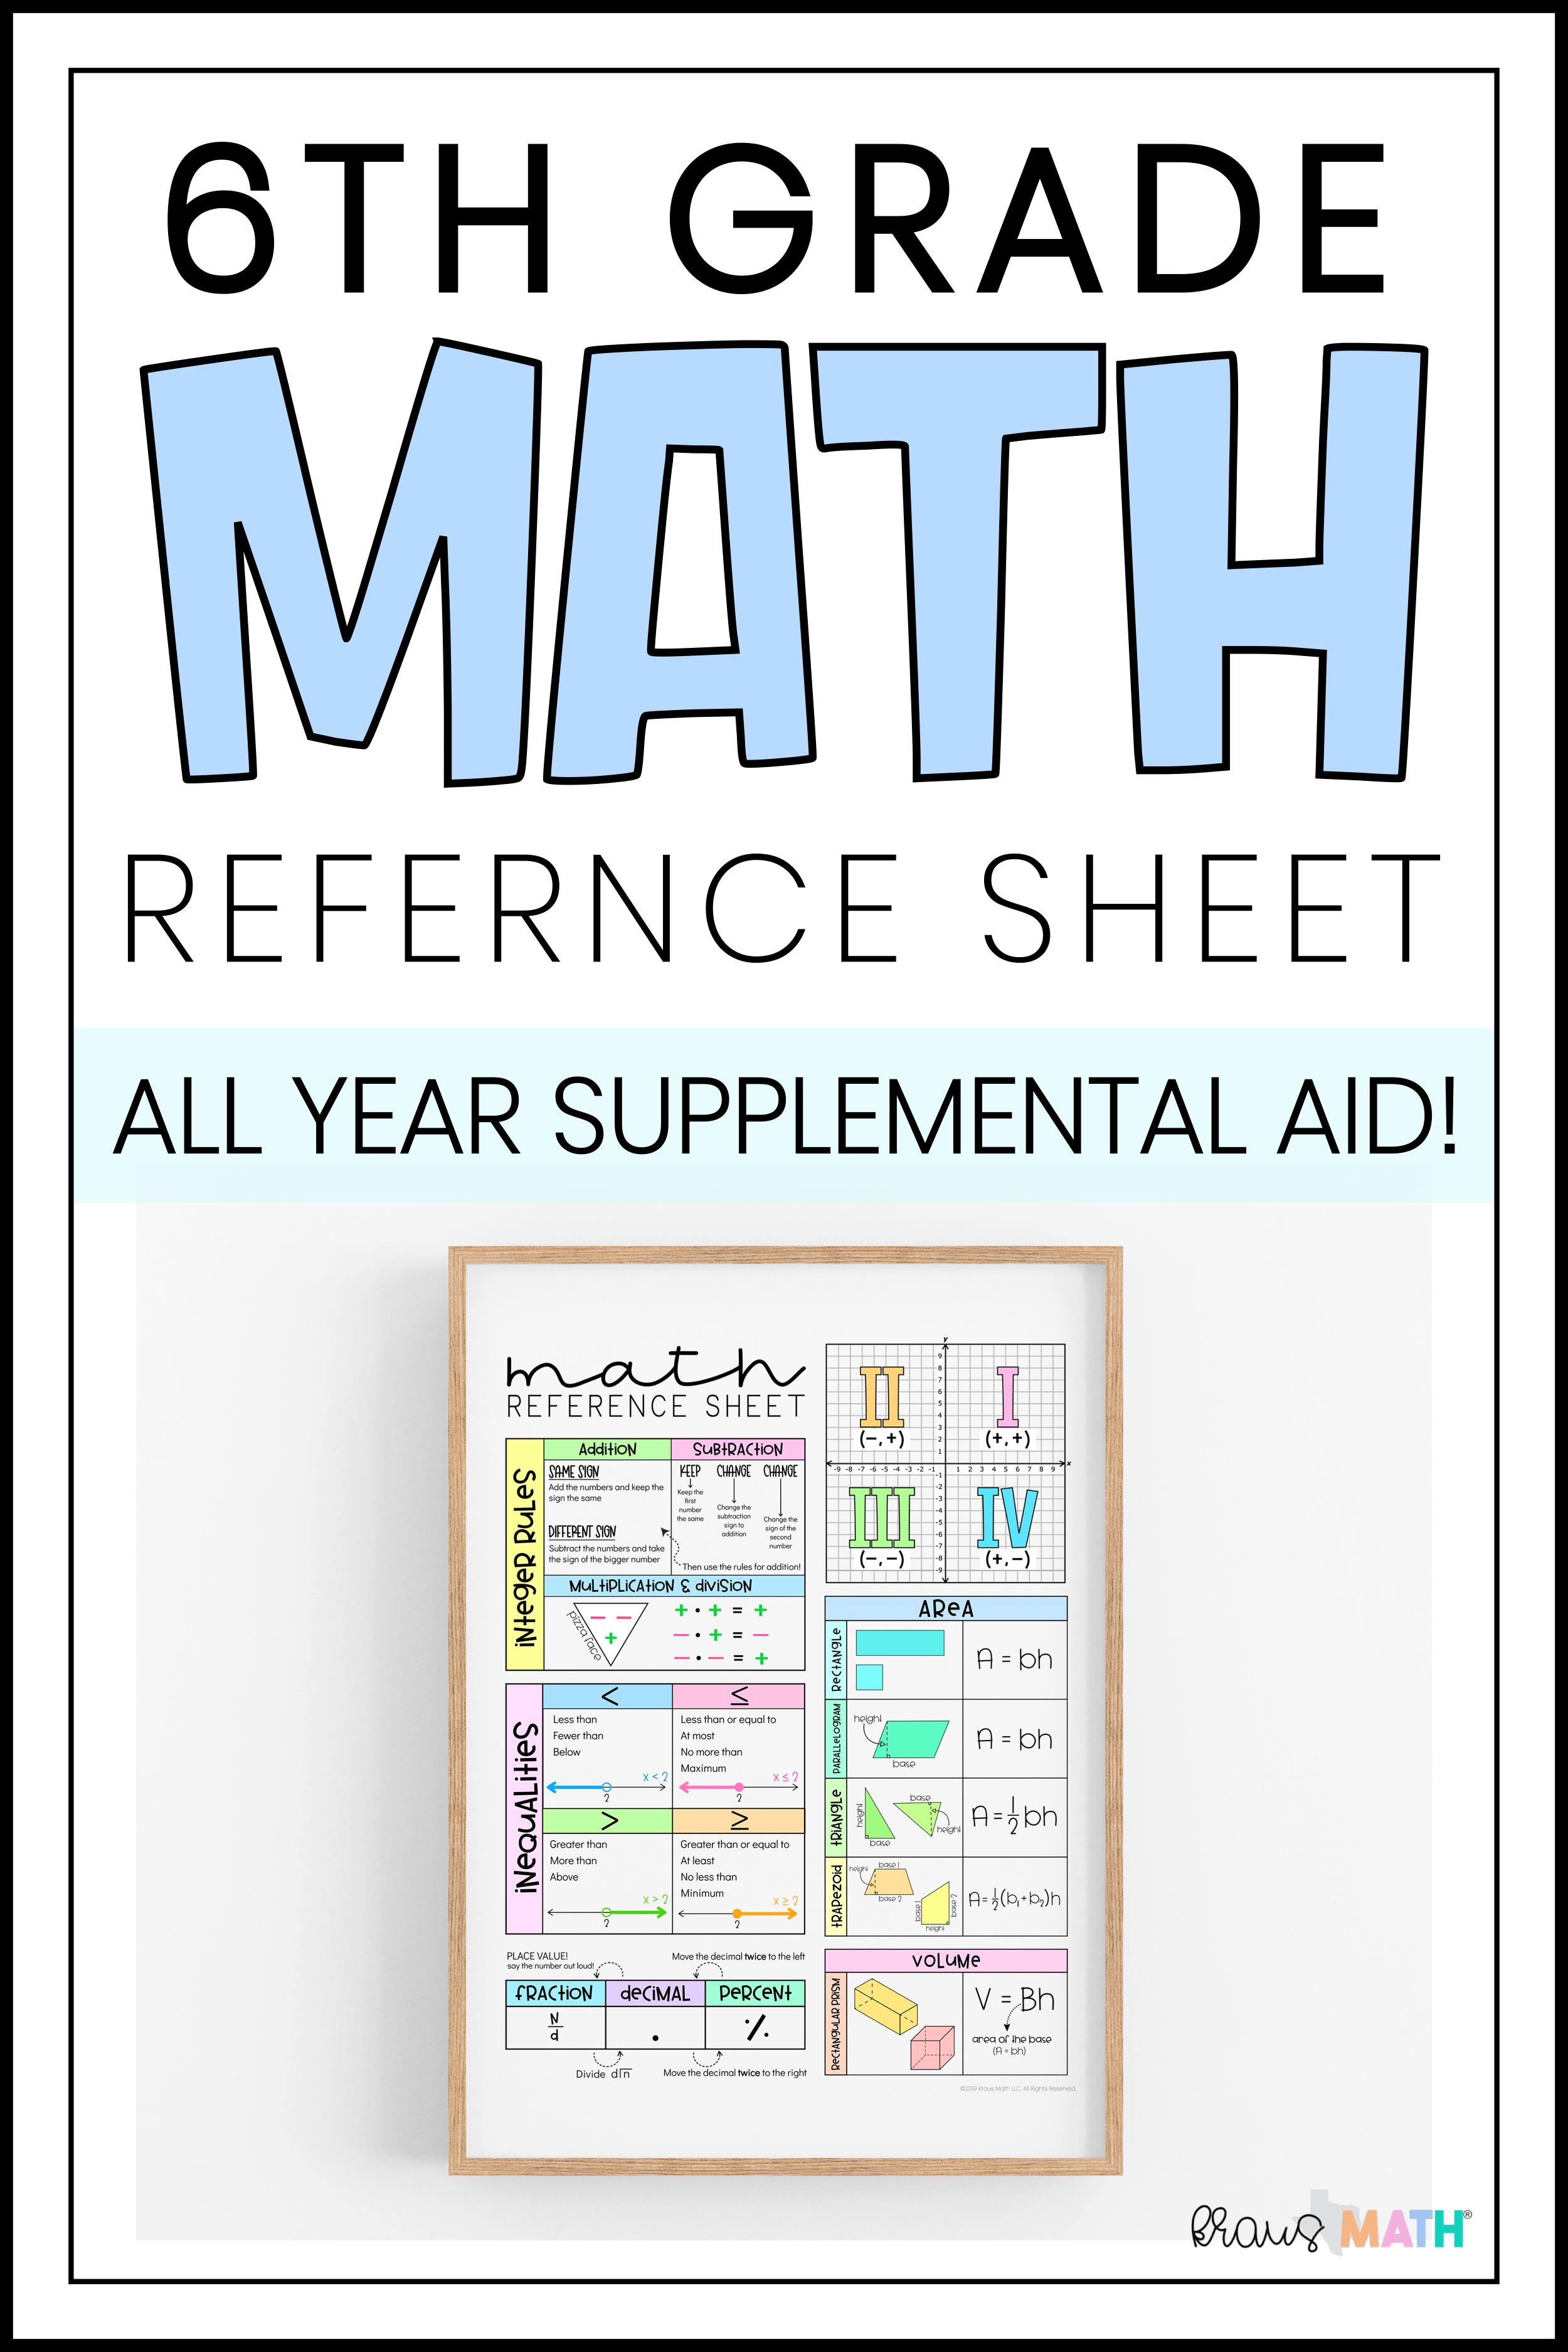 6th Grade Math Reference Sheet